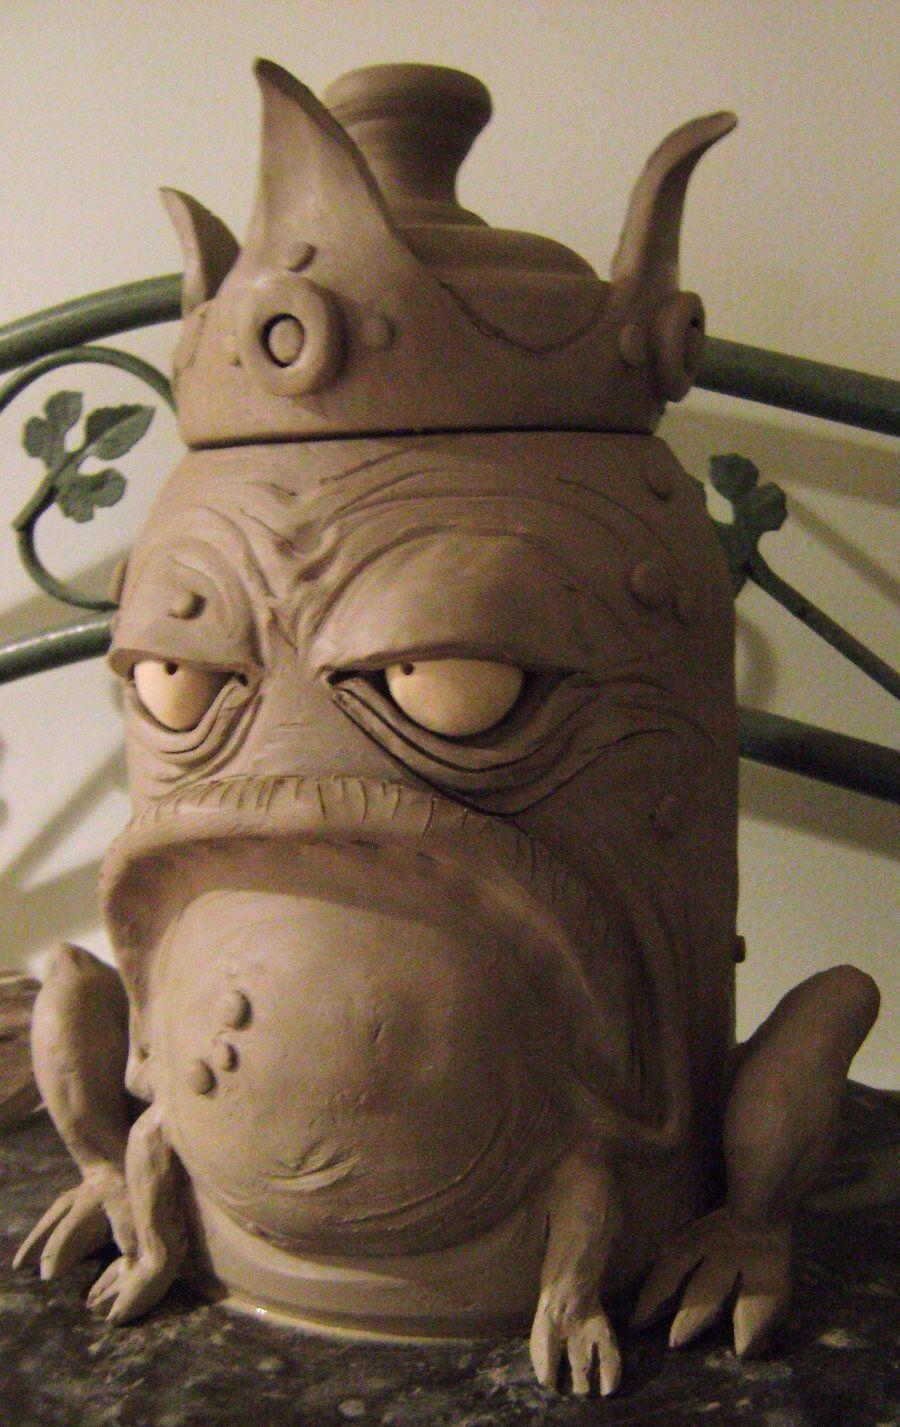 King Frog Cookie Jar Wip By Thebigduluth On Deviantart Pottery Sculpture Ceramic Sculpture Ceramics